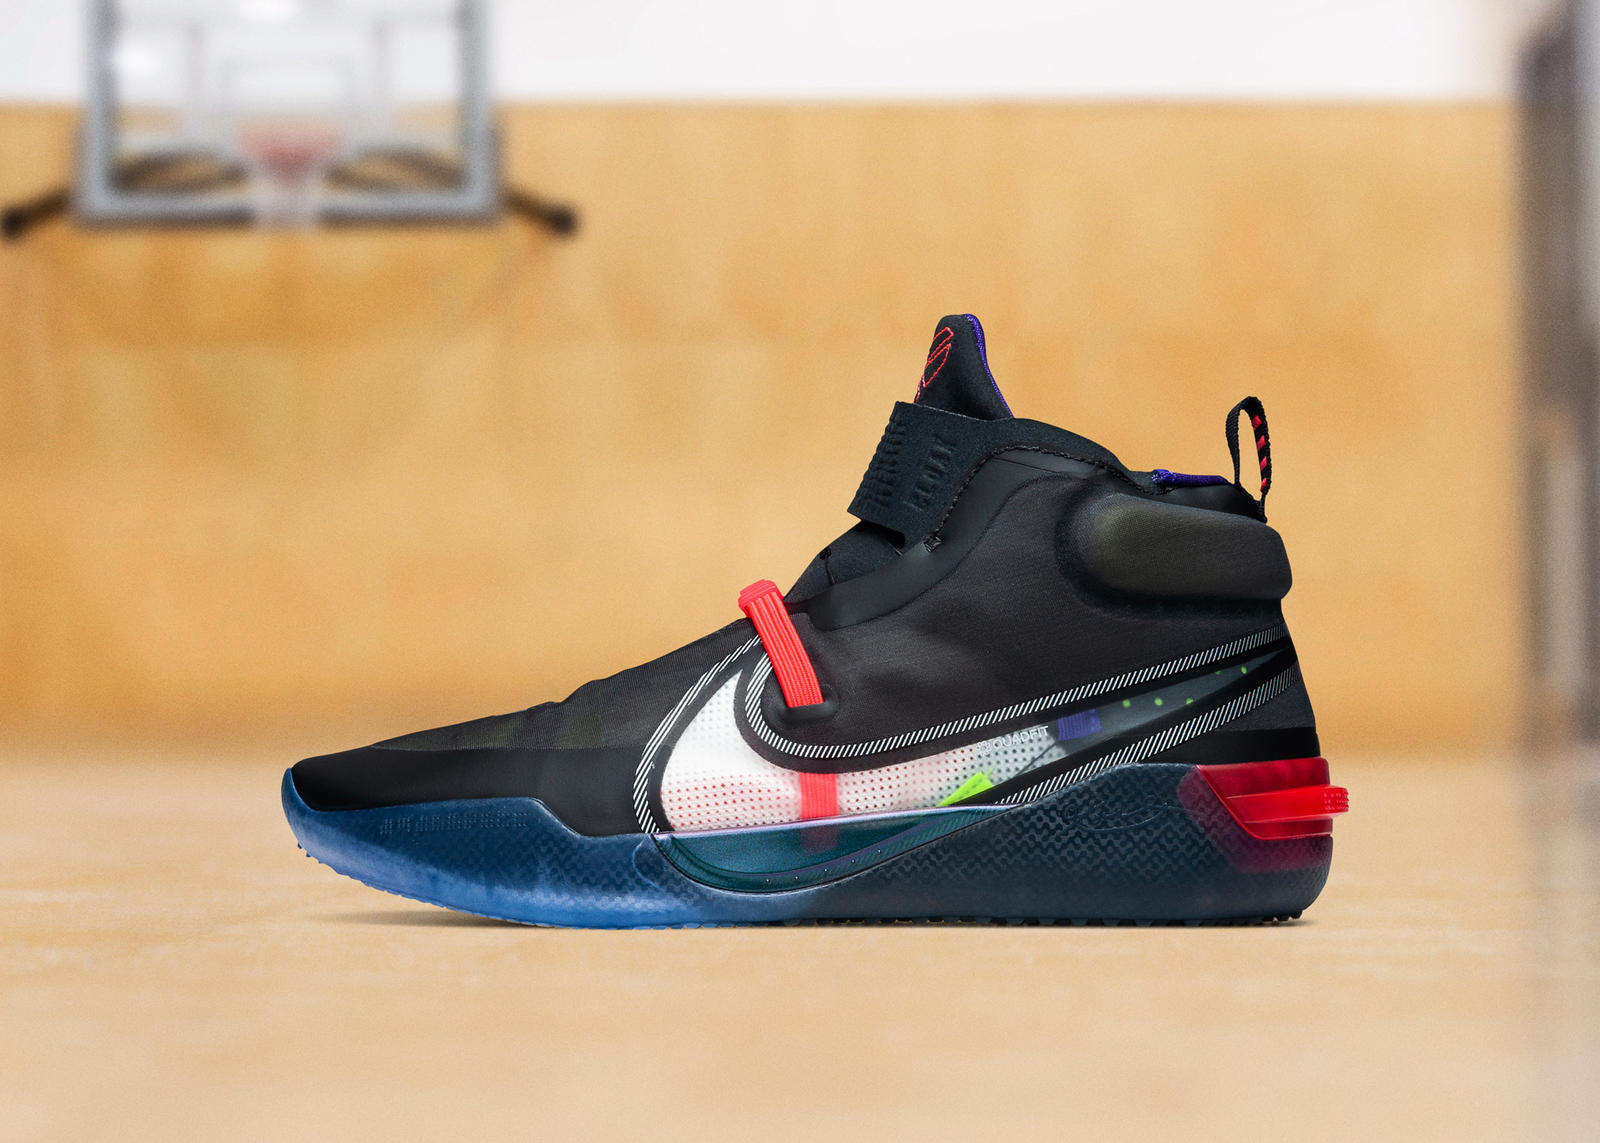 NikeNews_Kobe_AD_NXT_FF_1_rectangle_1600.jpg